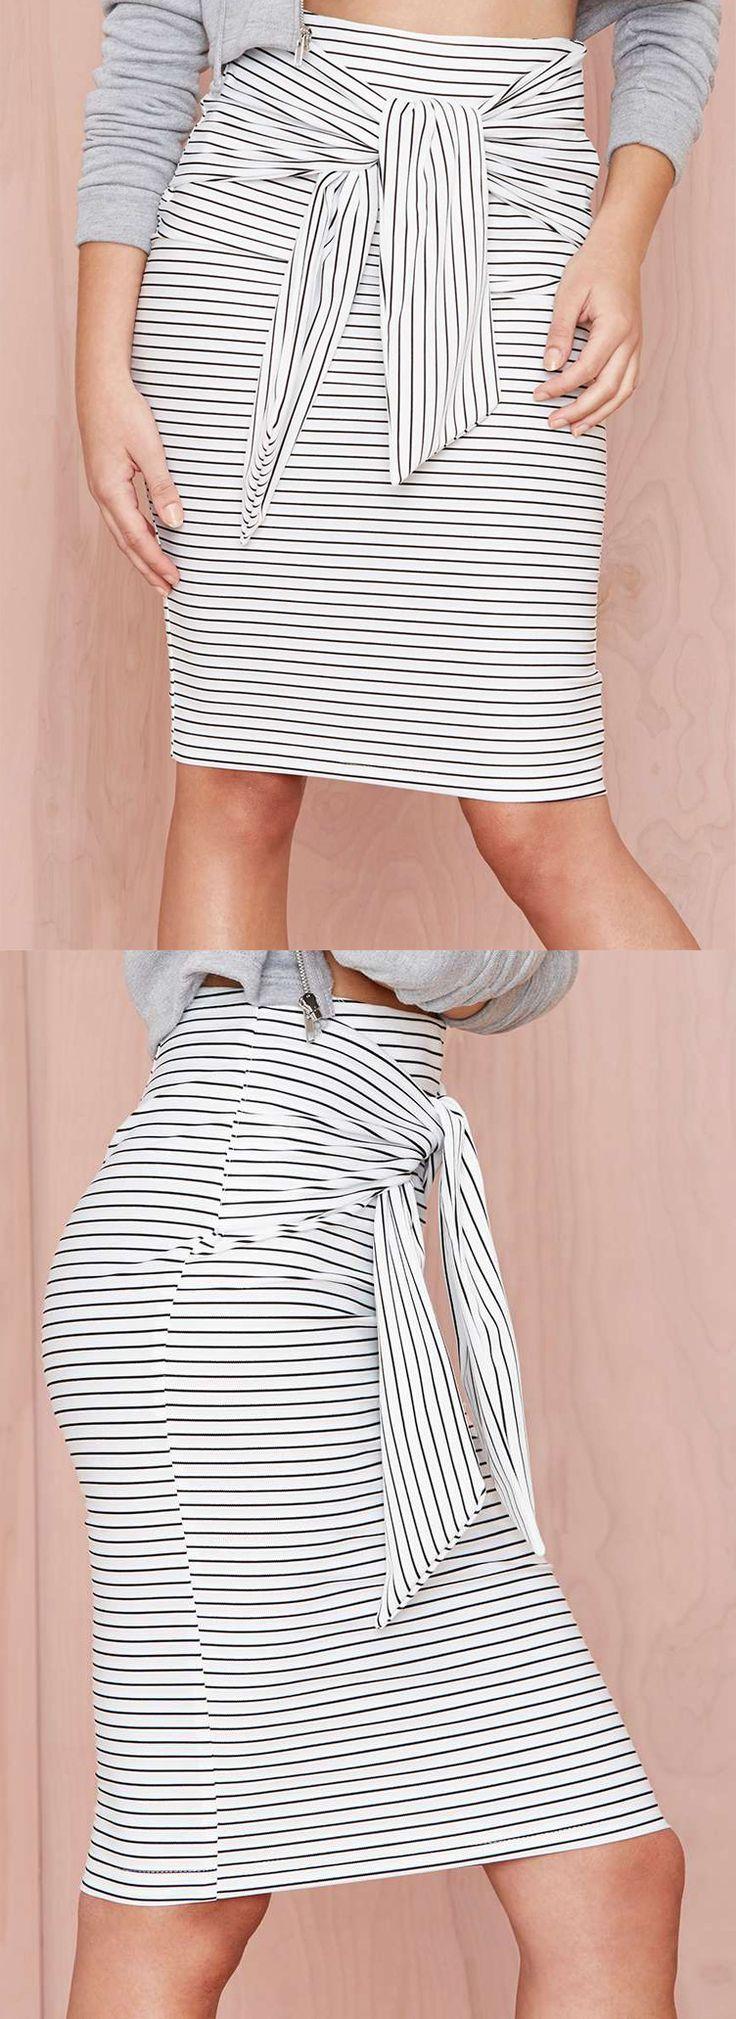 Striped skirt//